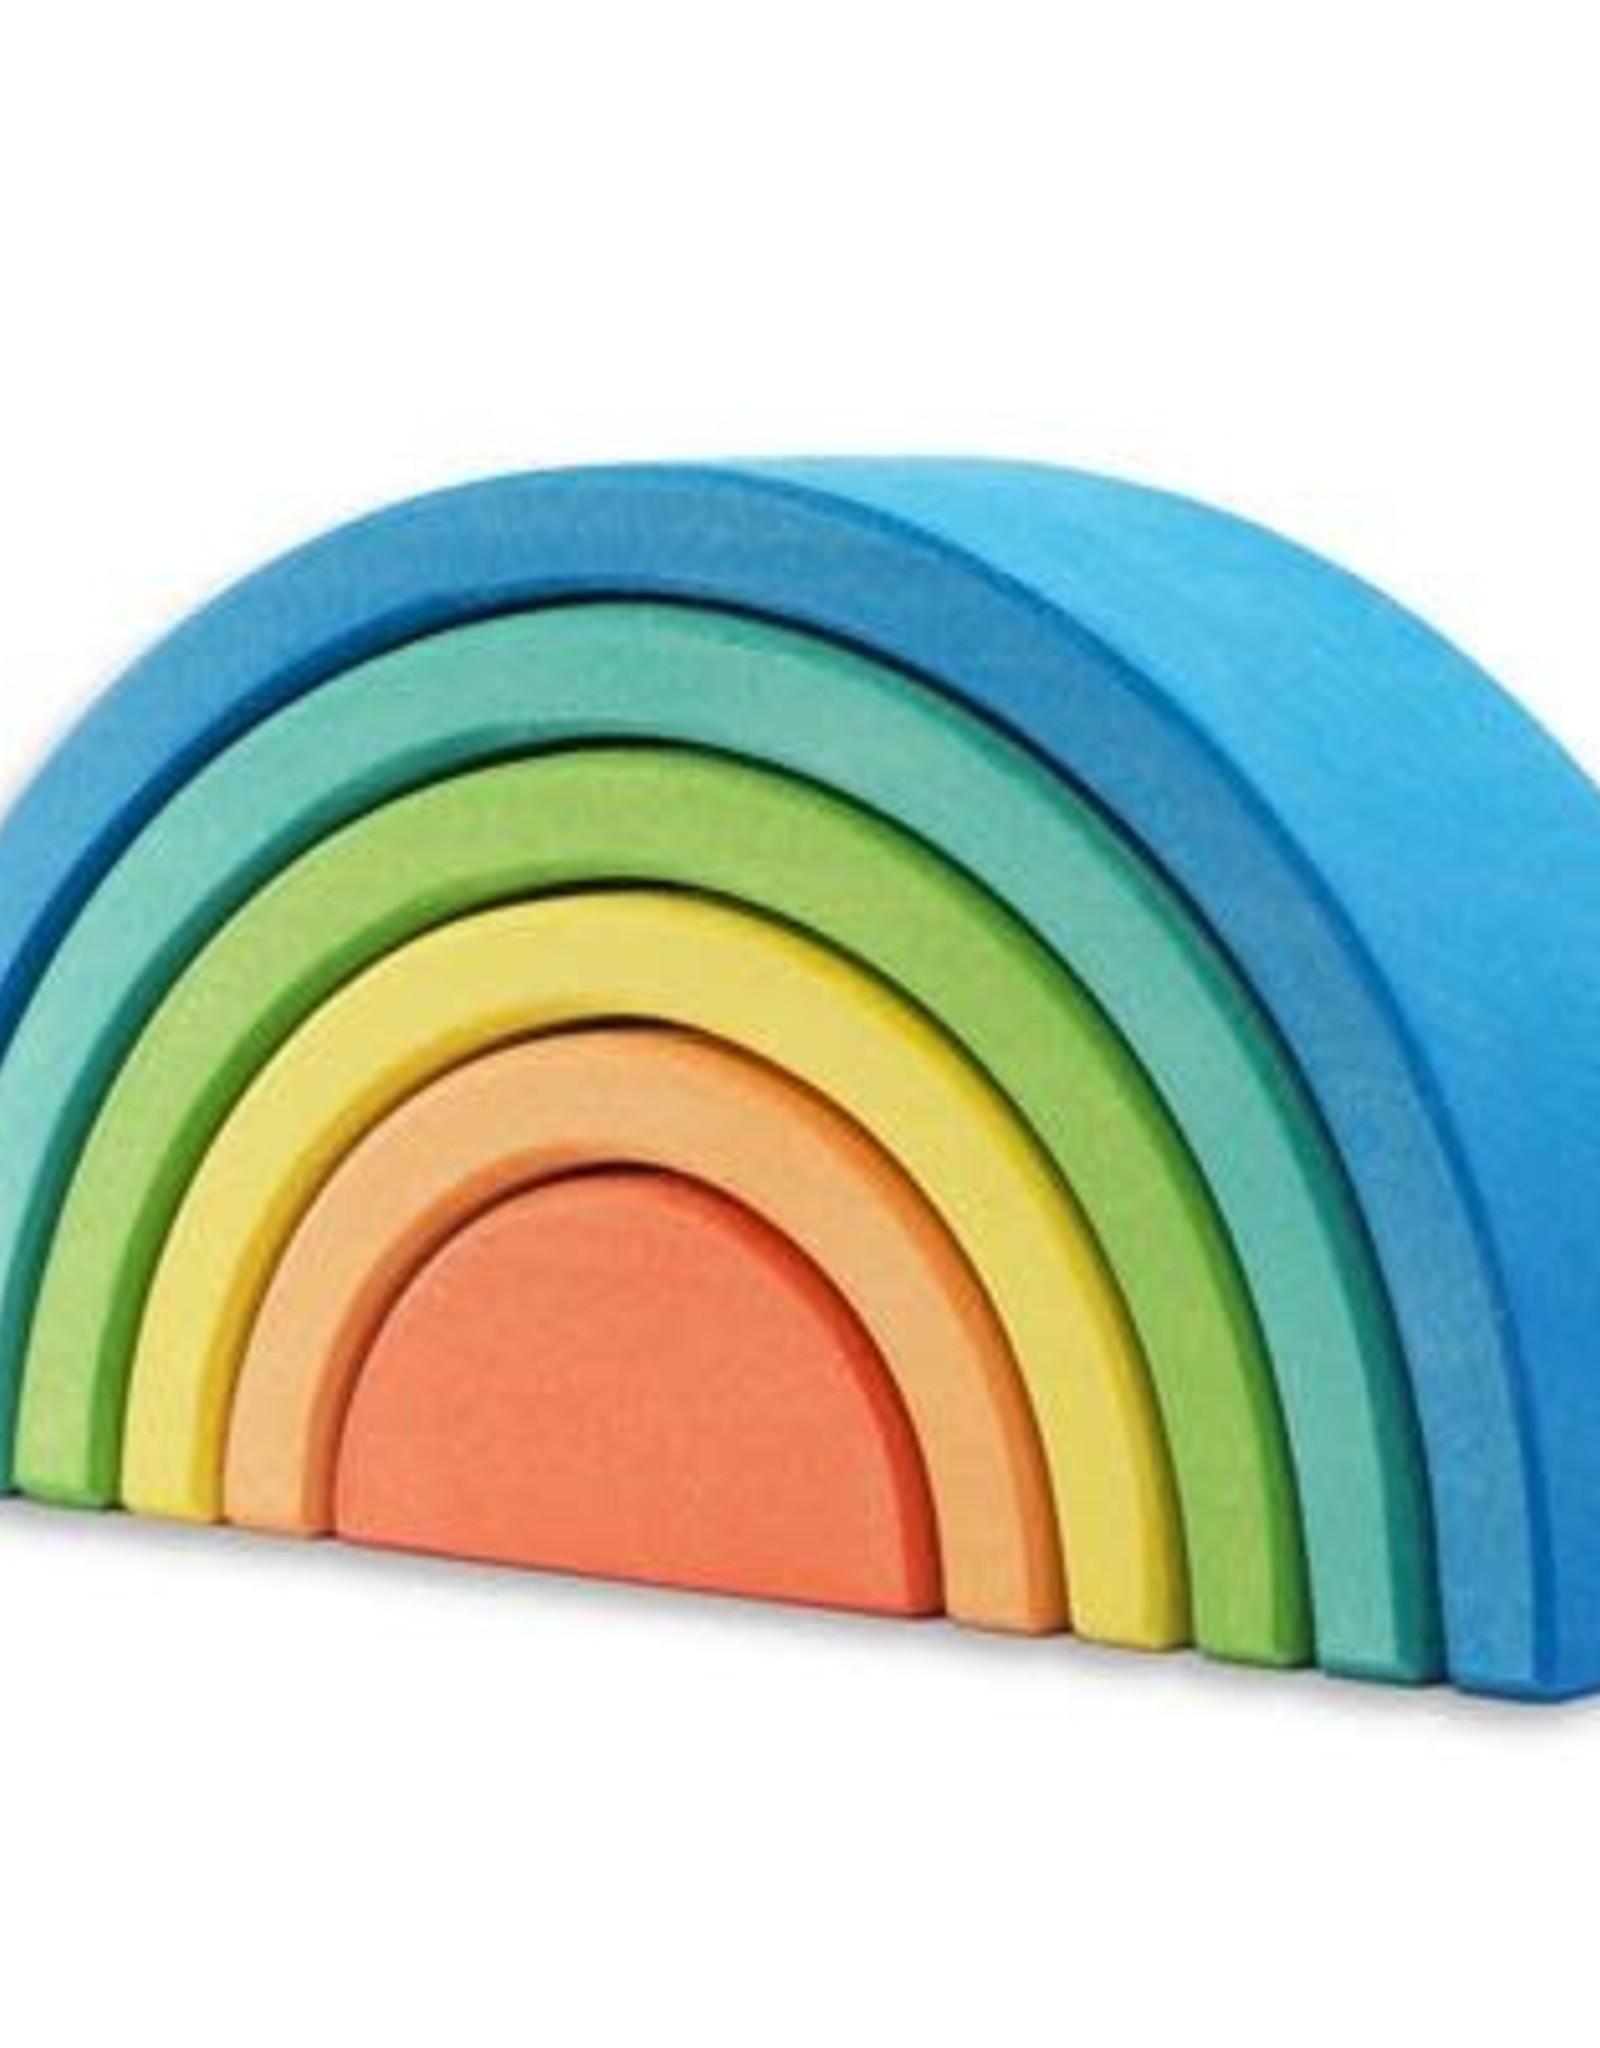 Ocamora 6 Piece Wooden Rainbow Stacker - Blue